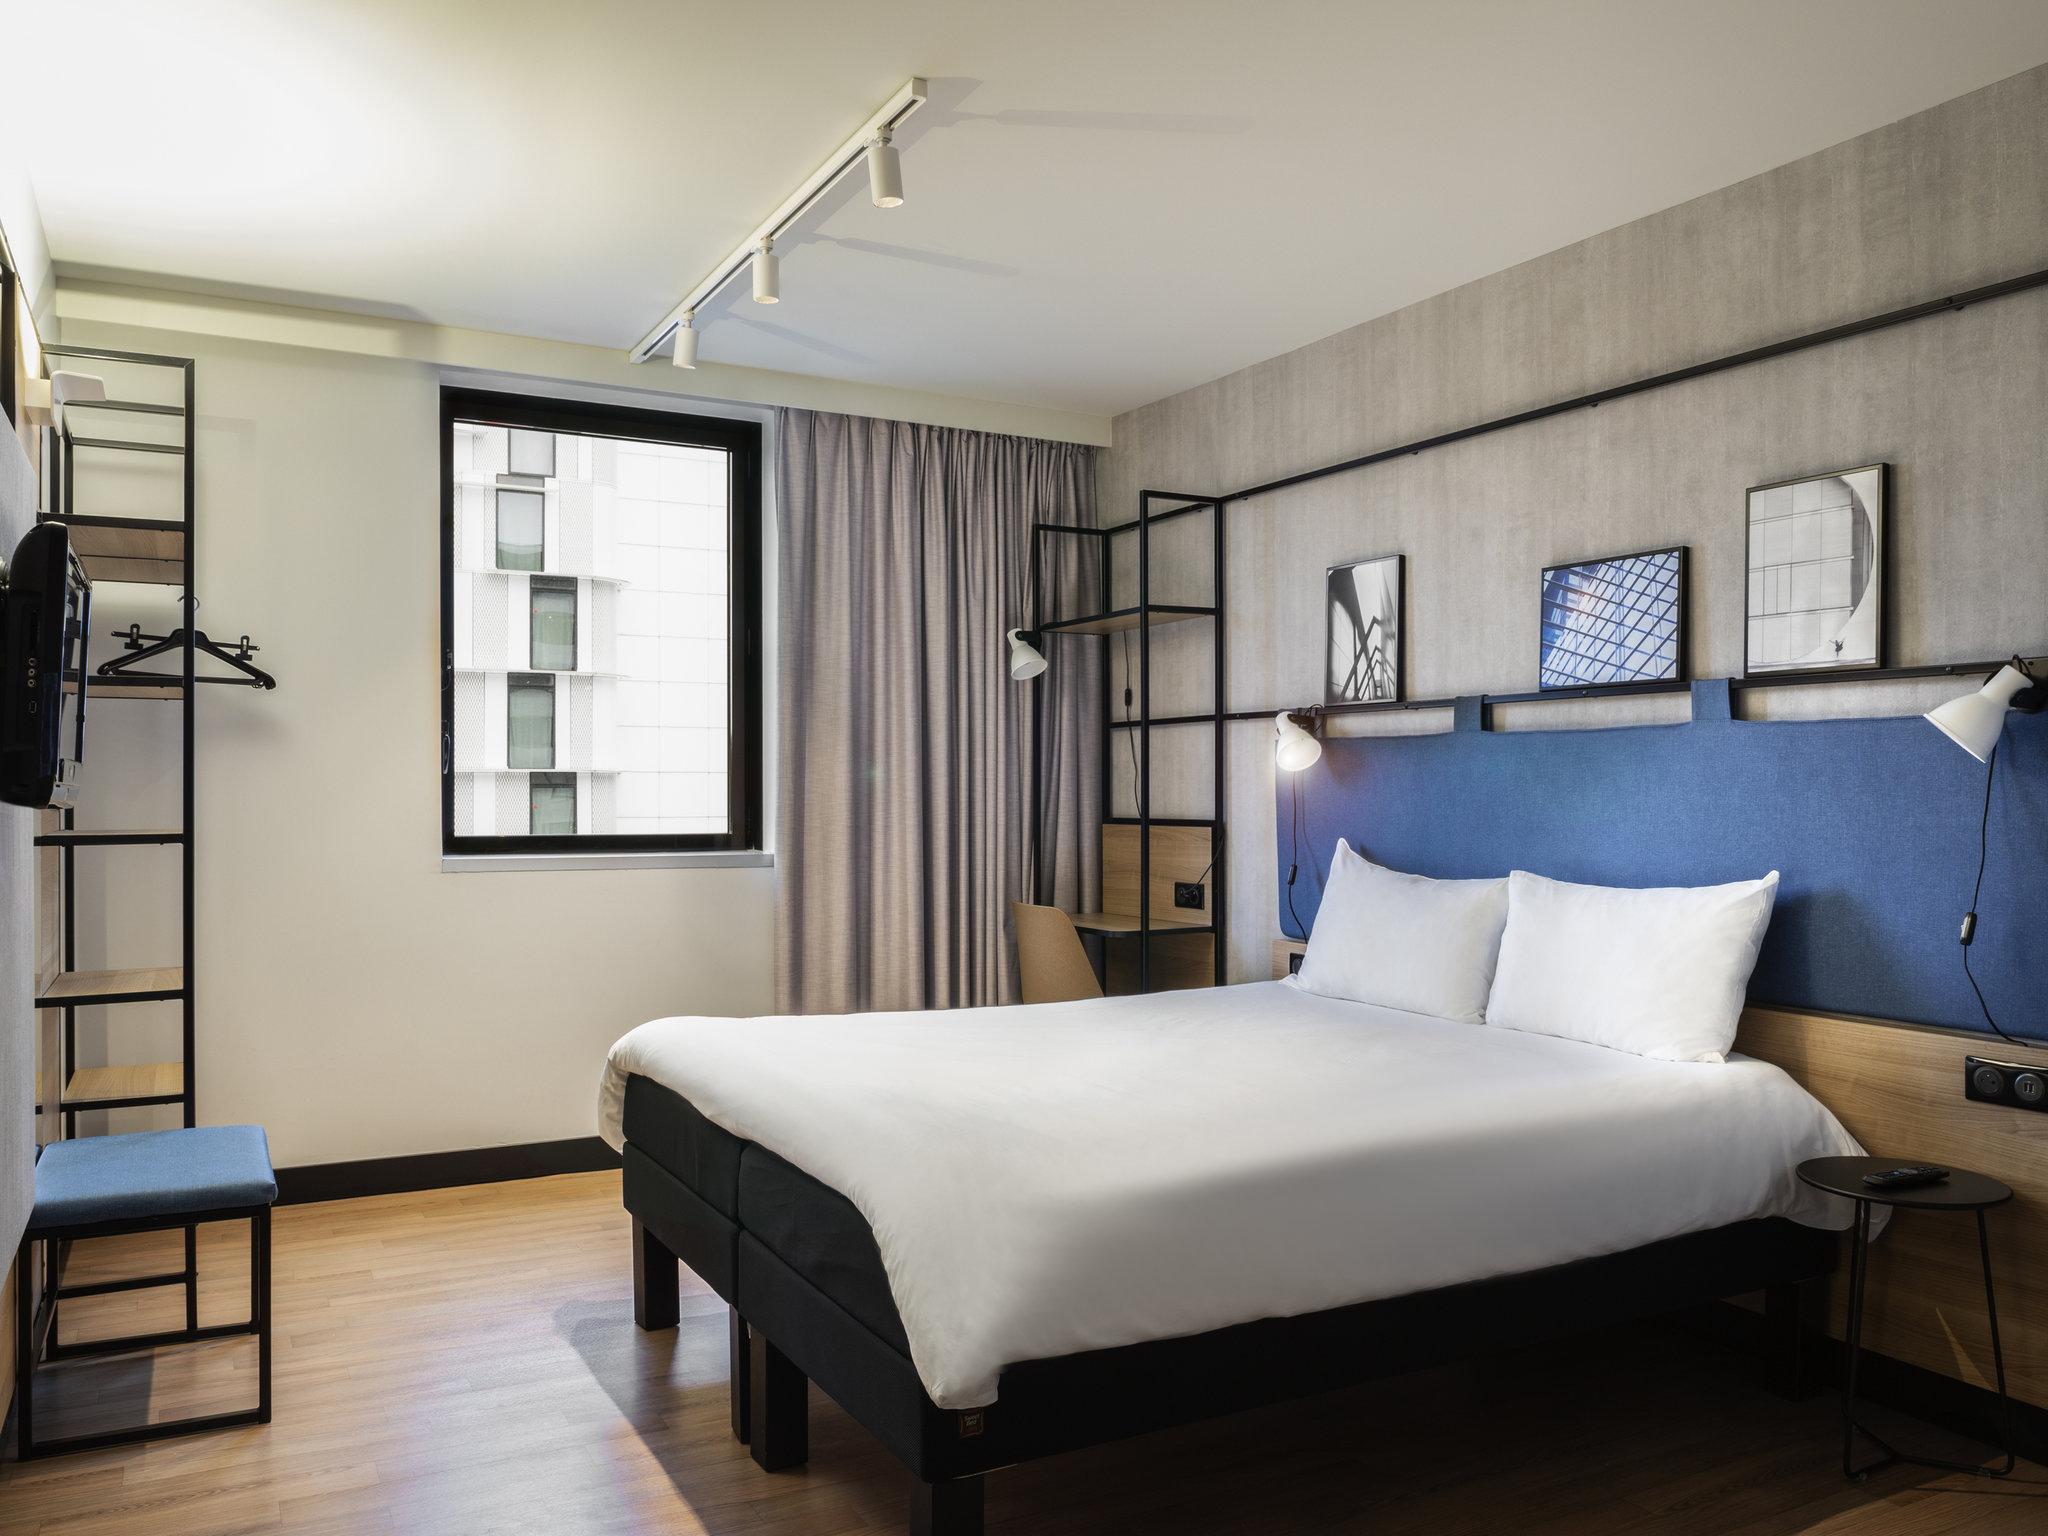 hotel ibis paris cdg airport roissypole 95701 roissy. Black Bedroom Furniture Sets. Home Design Ideas